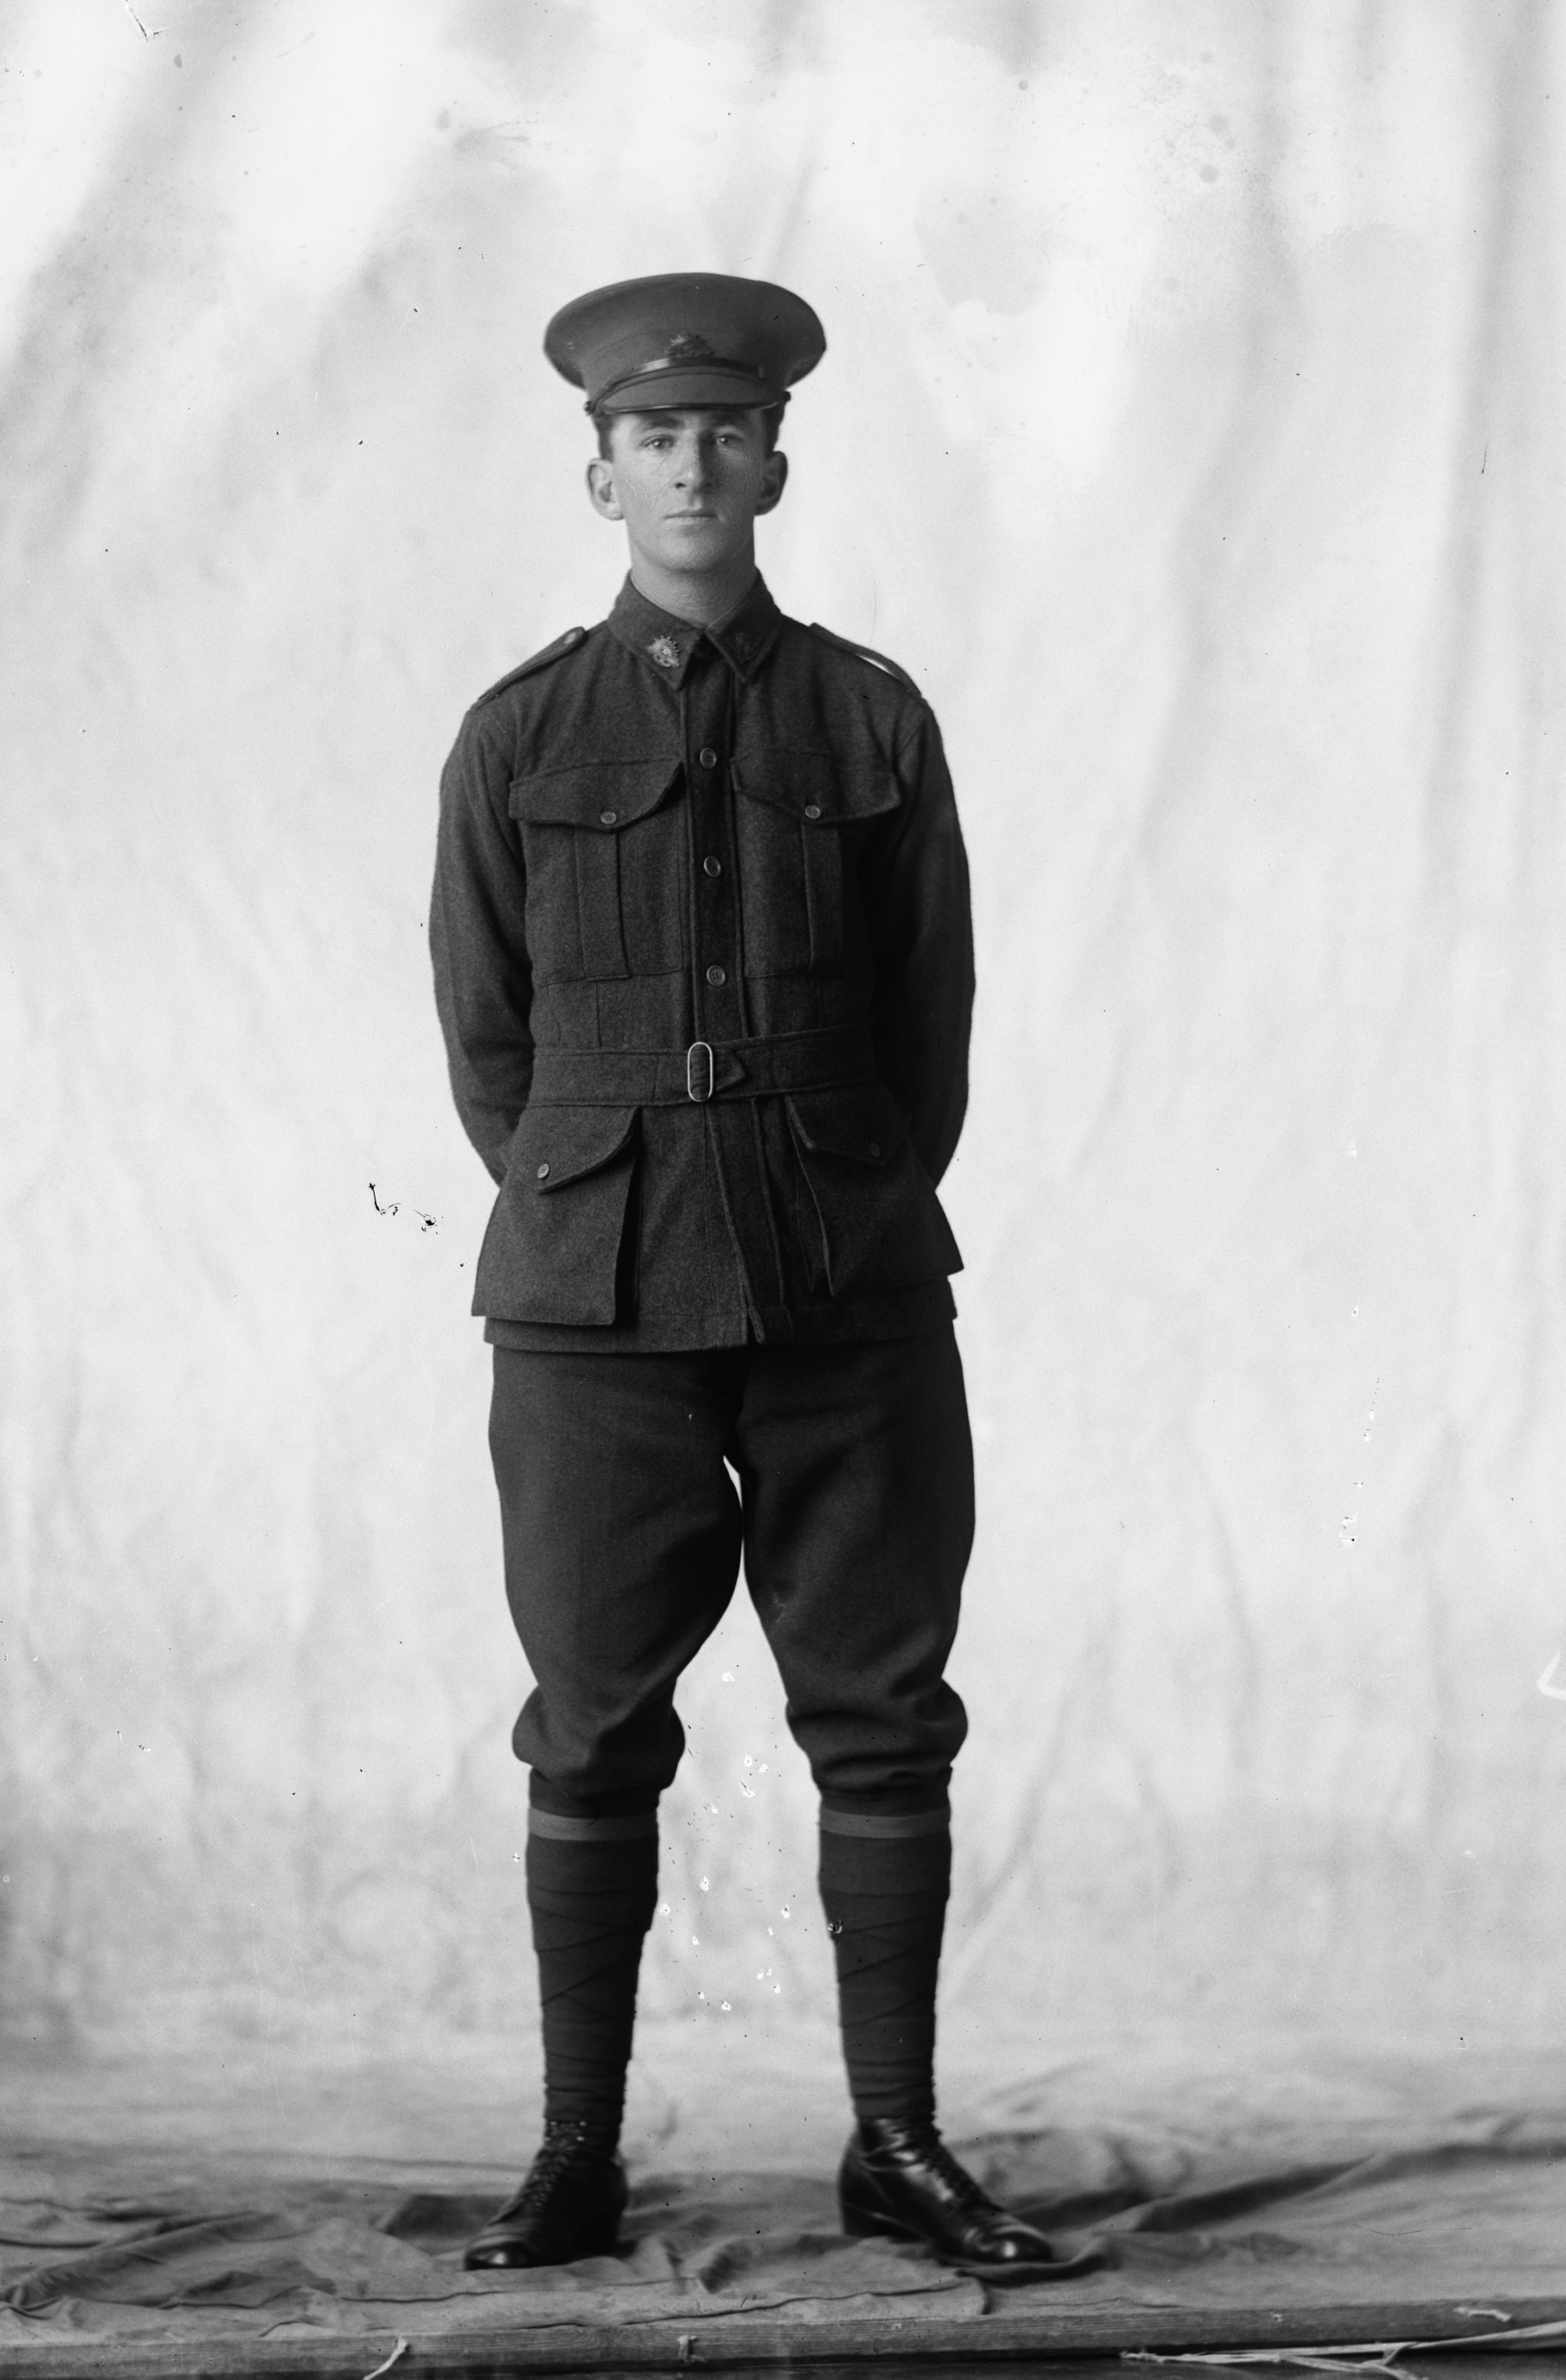 Private Thomas Ashcroft Perrie, 44th Battalion